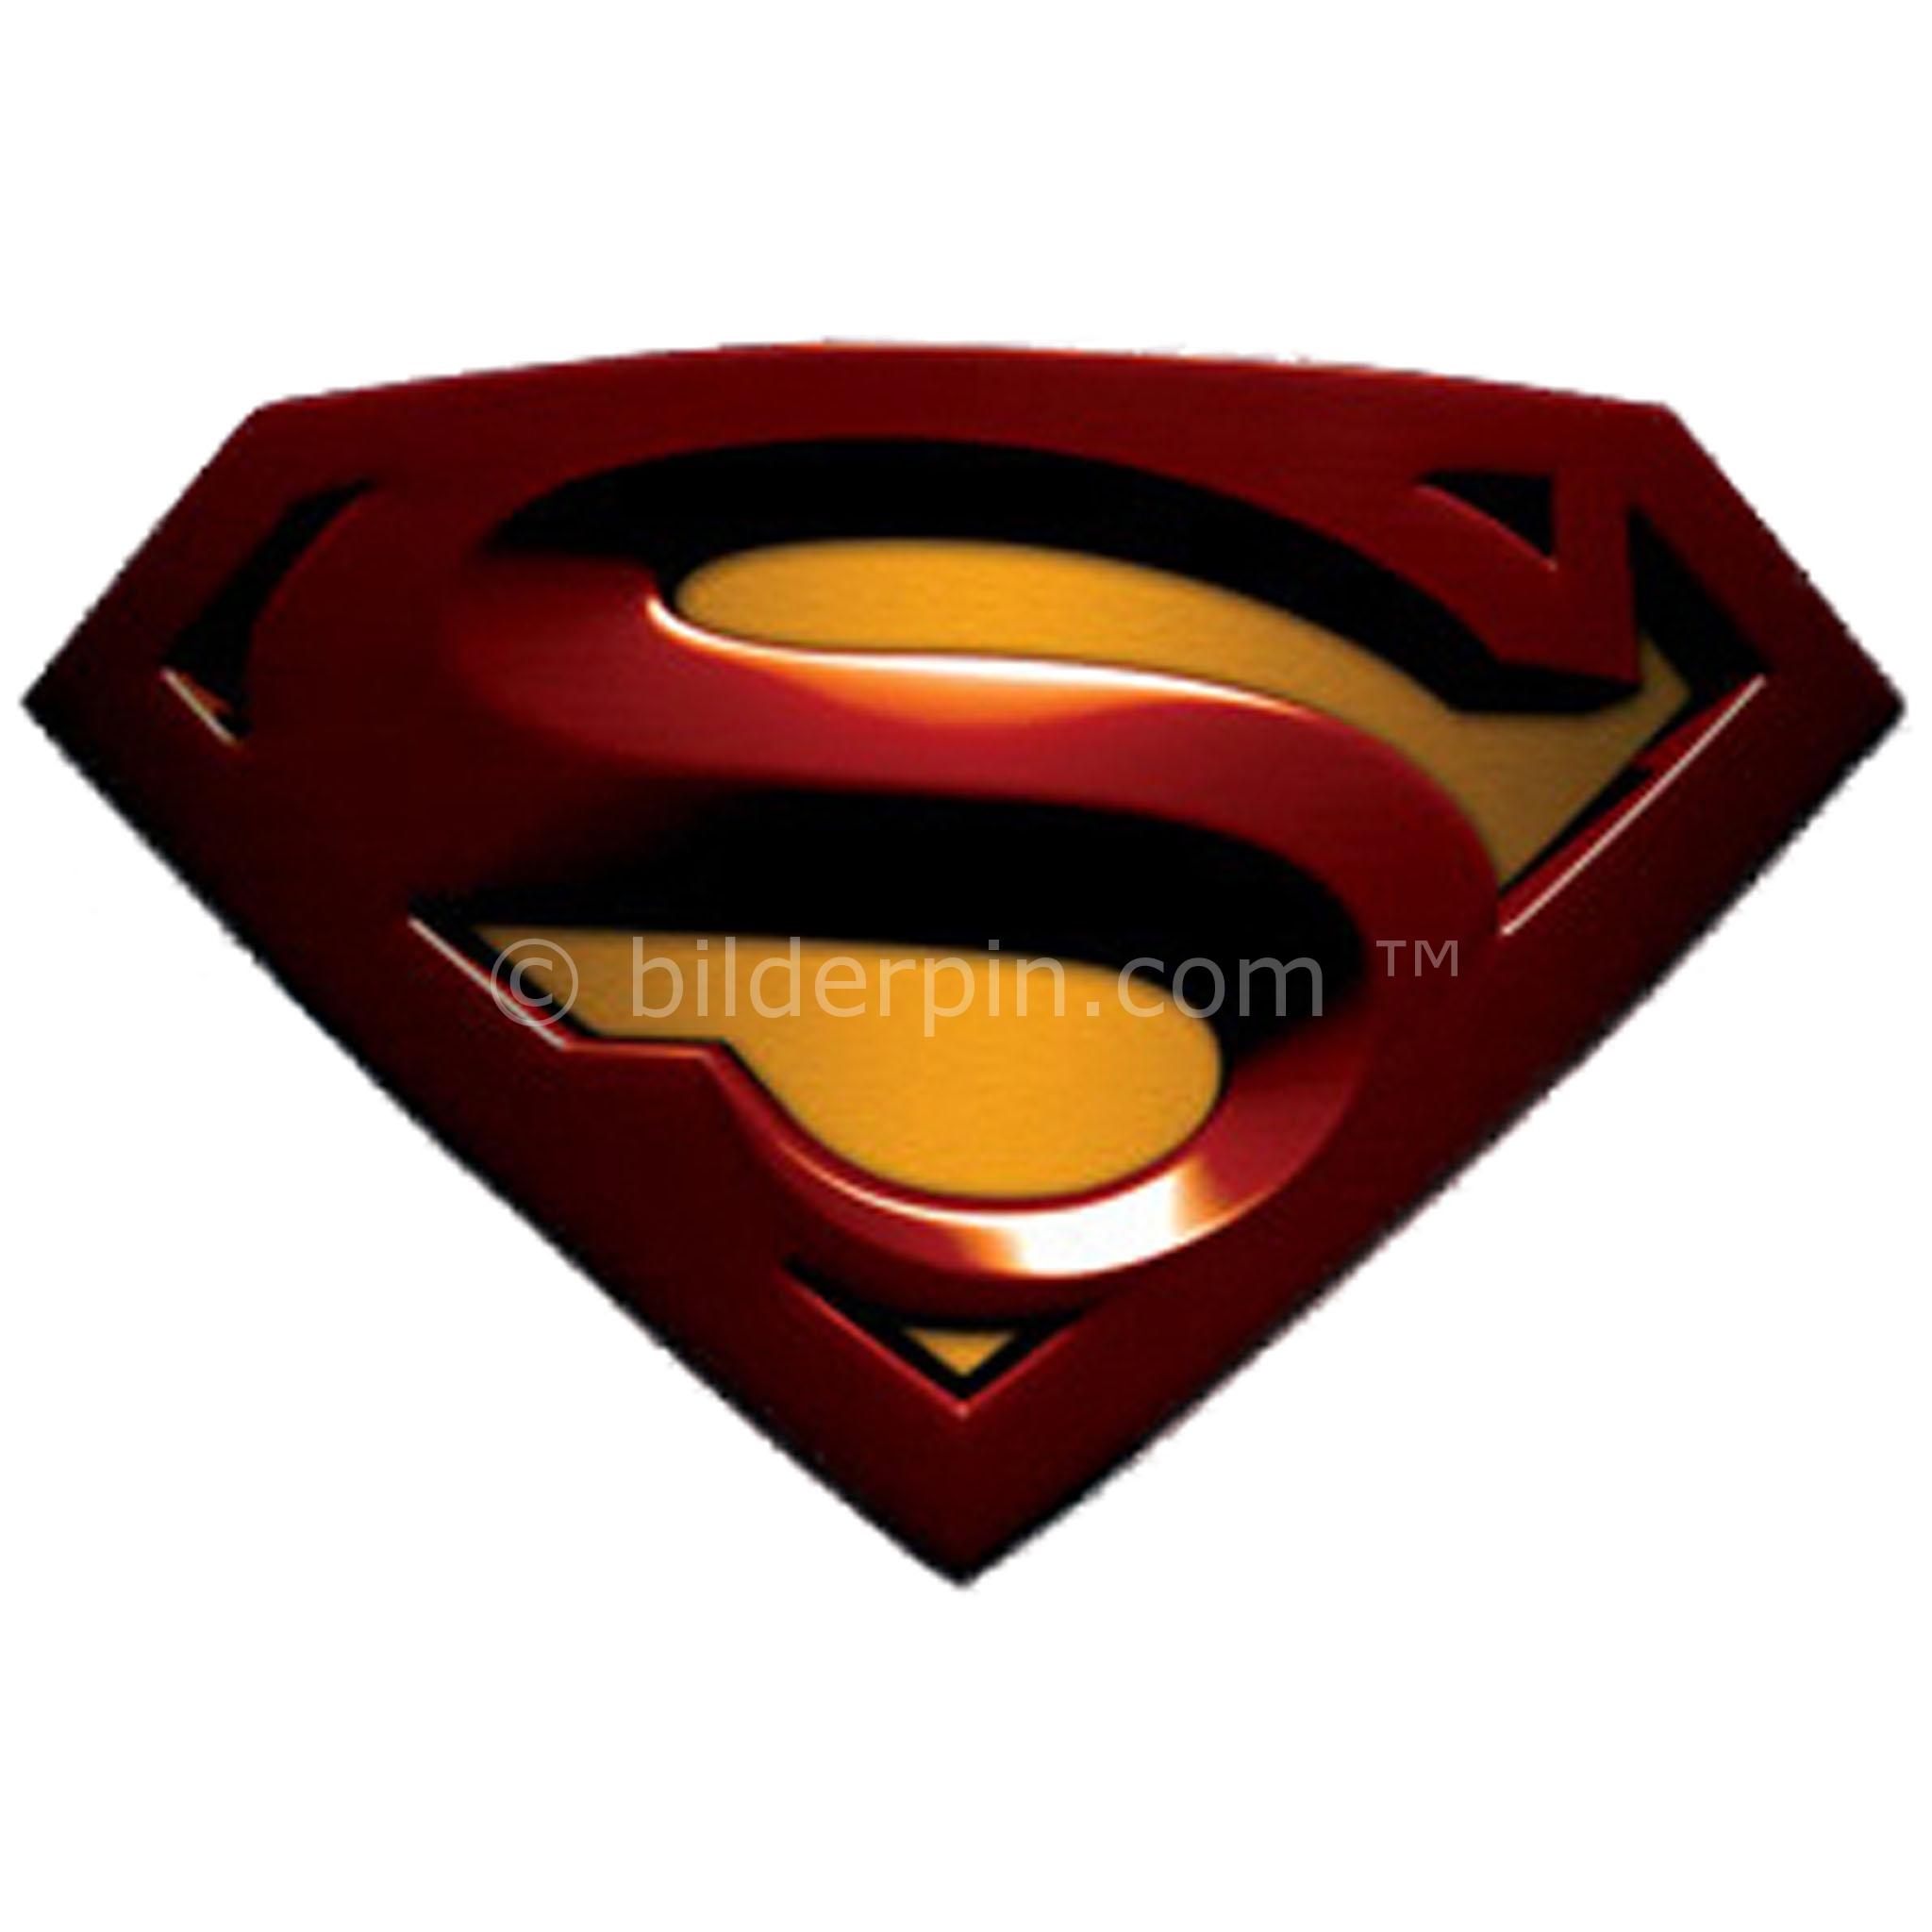 superman logo png - https://bilderpin/14282/superman-logo-png